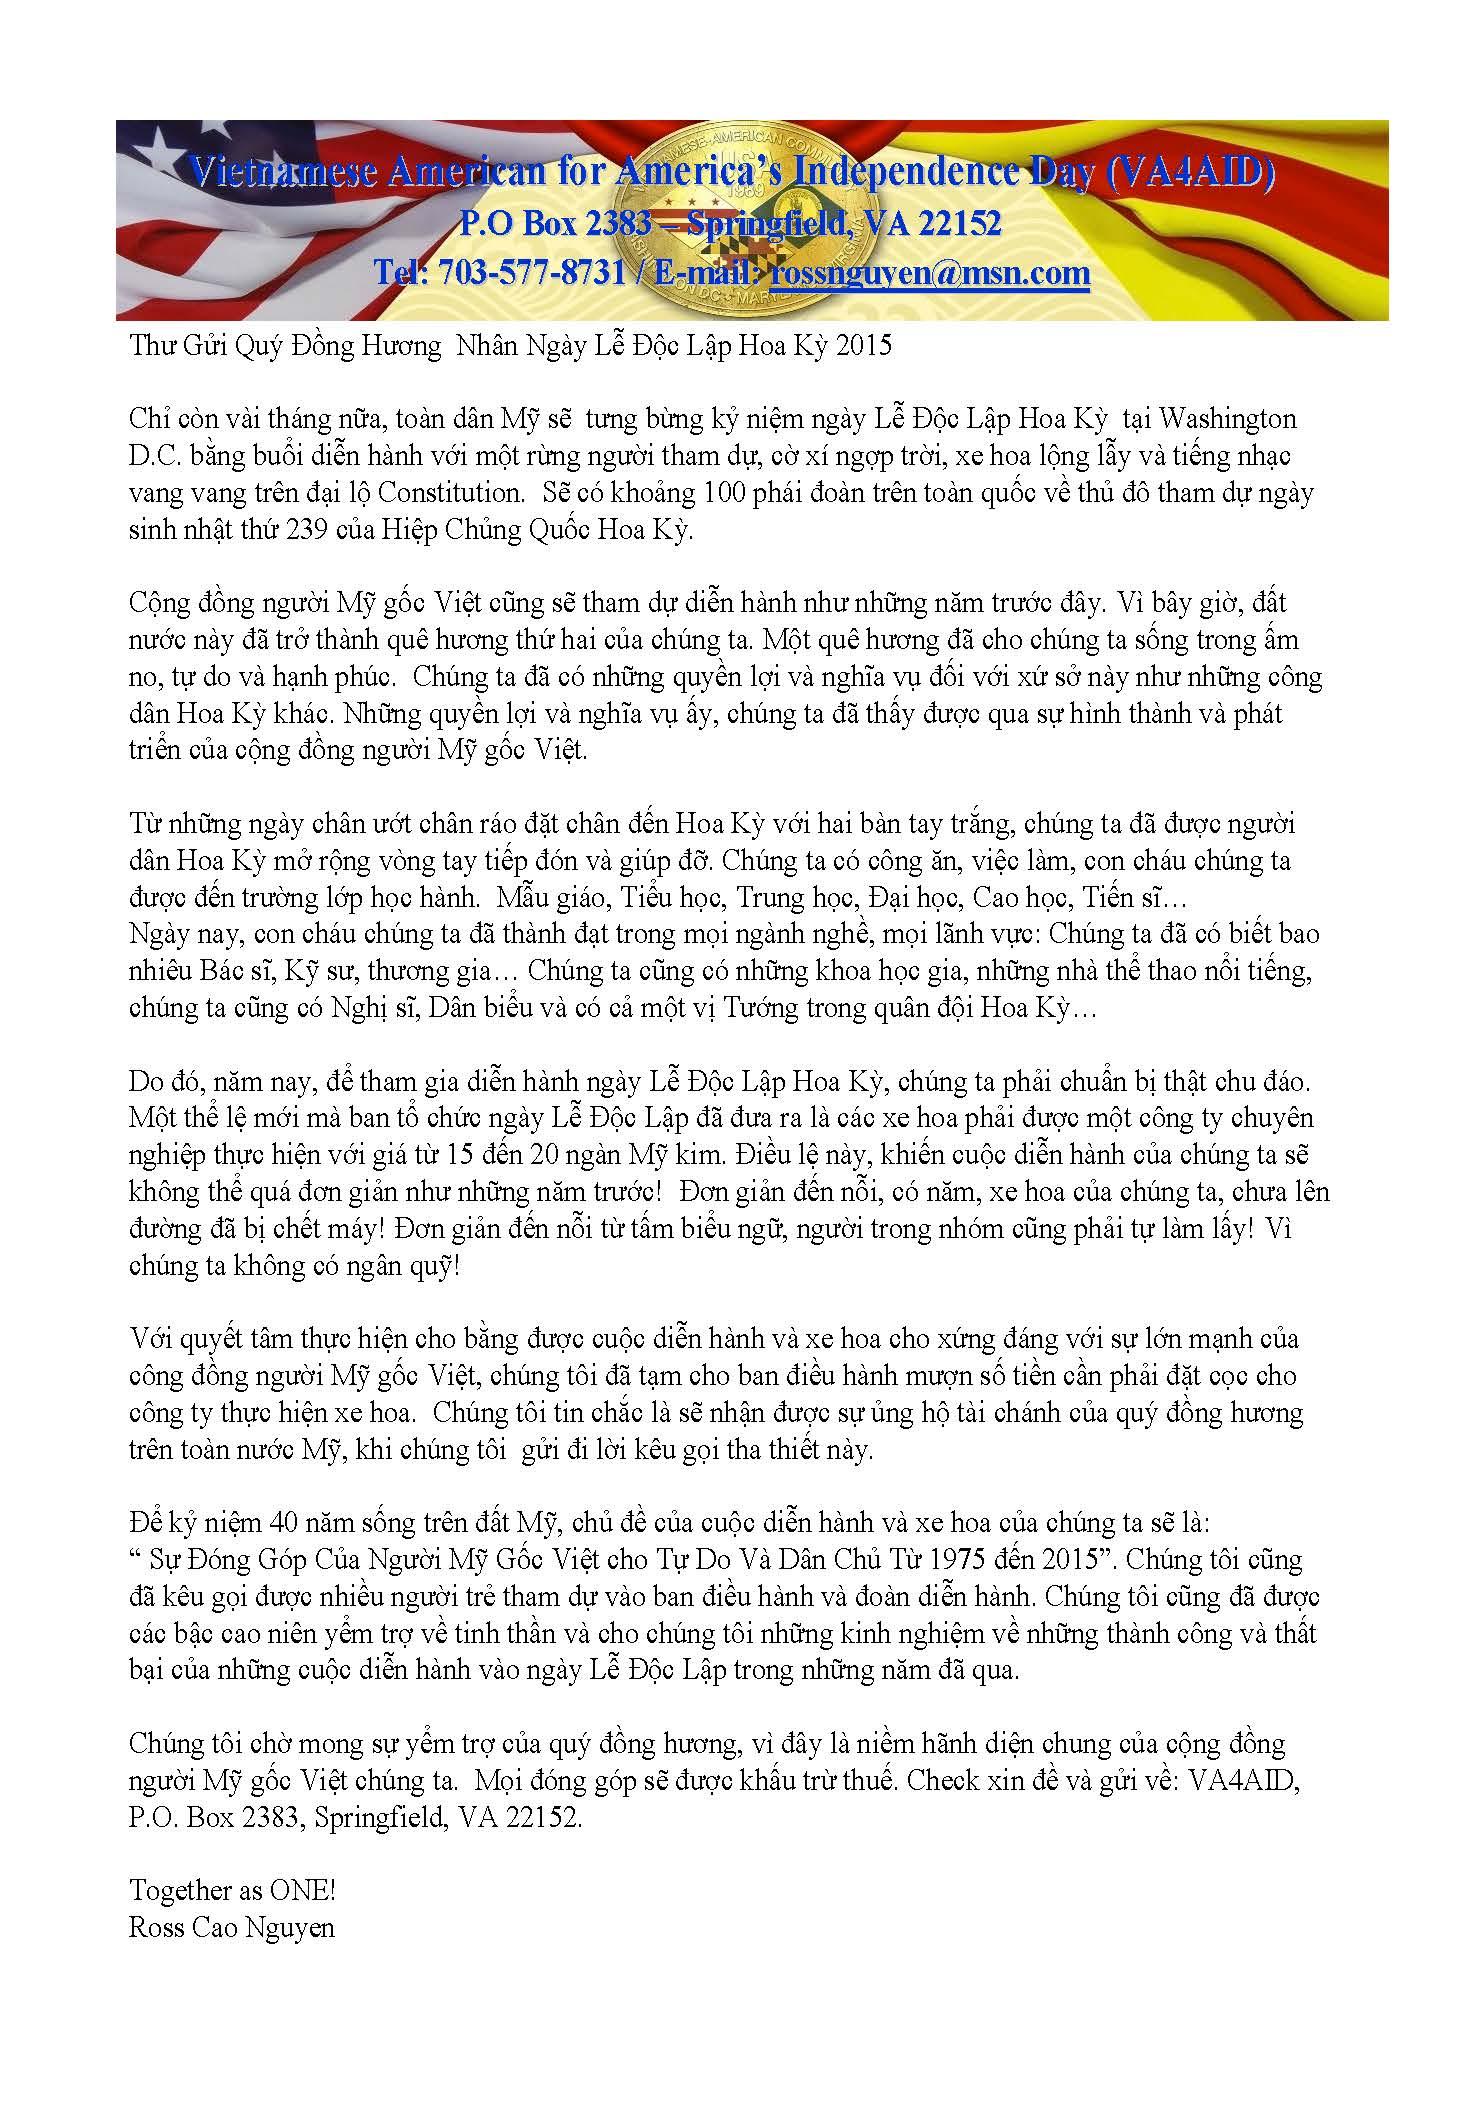 VA4AID2015 Fundraising Letter (Vietnamese)